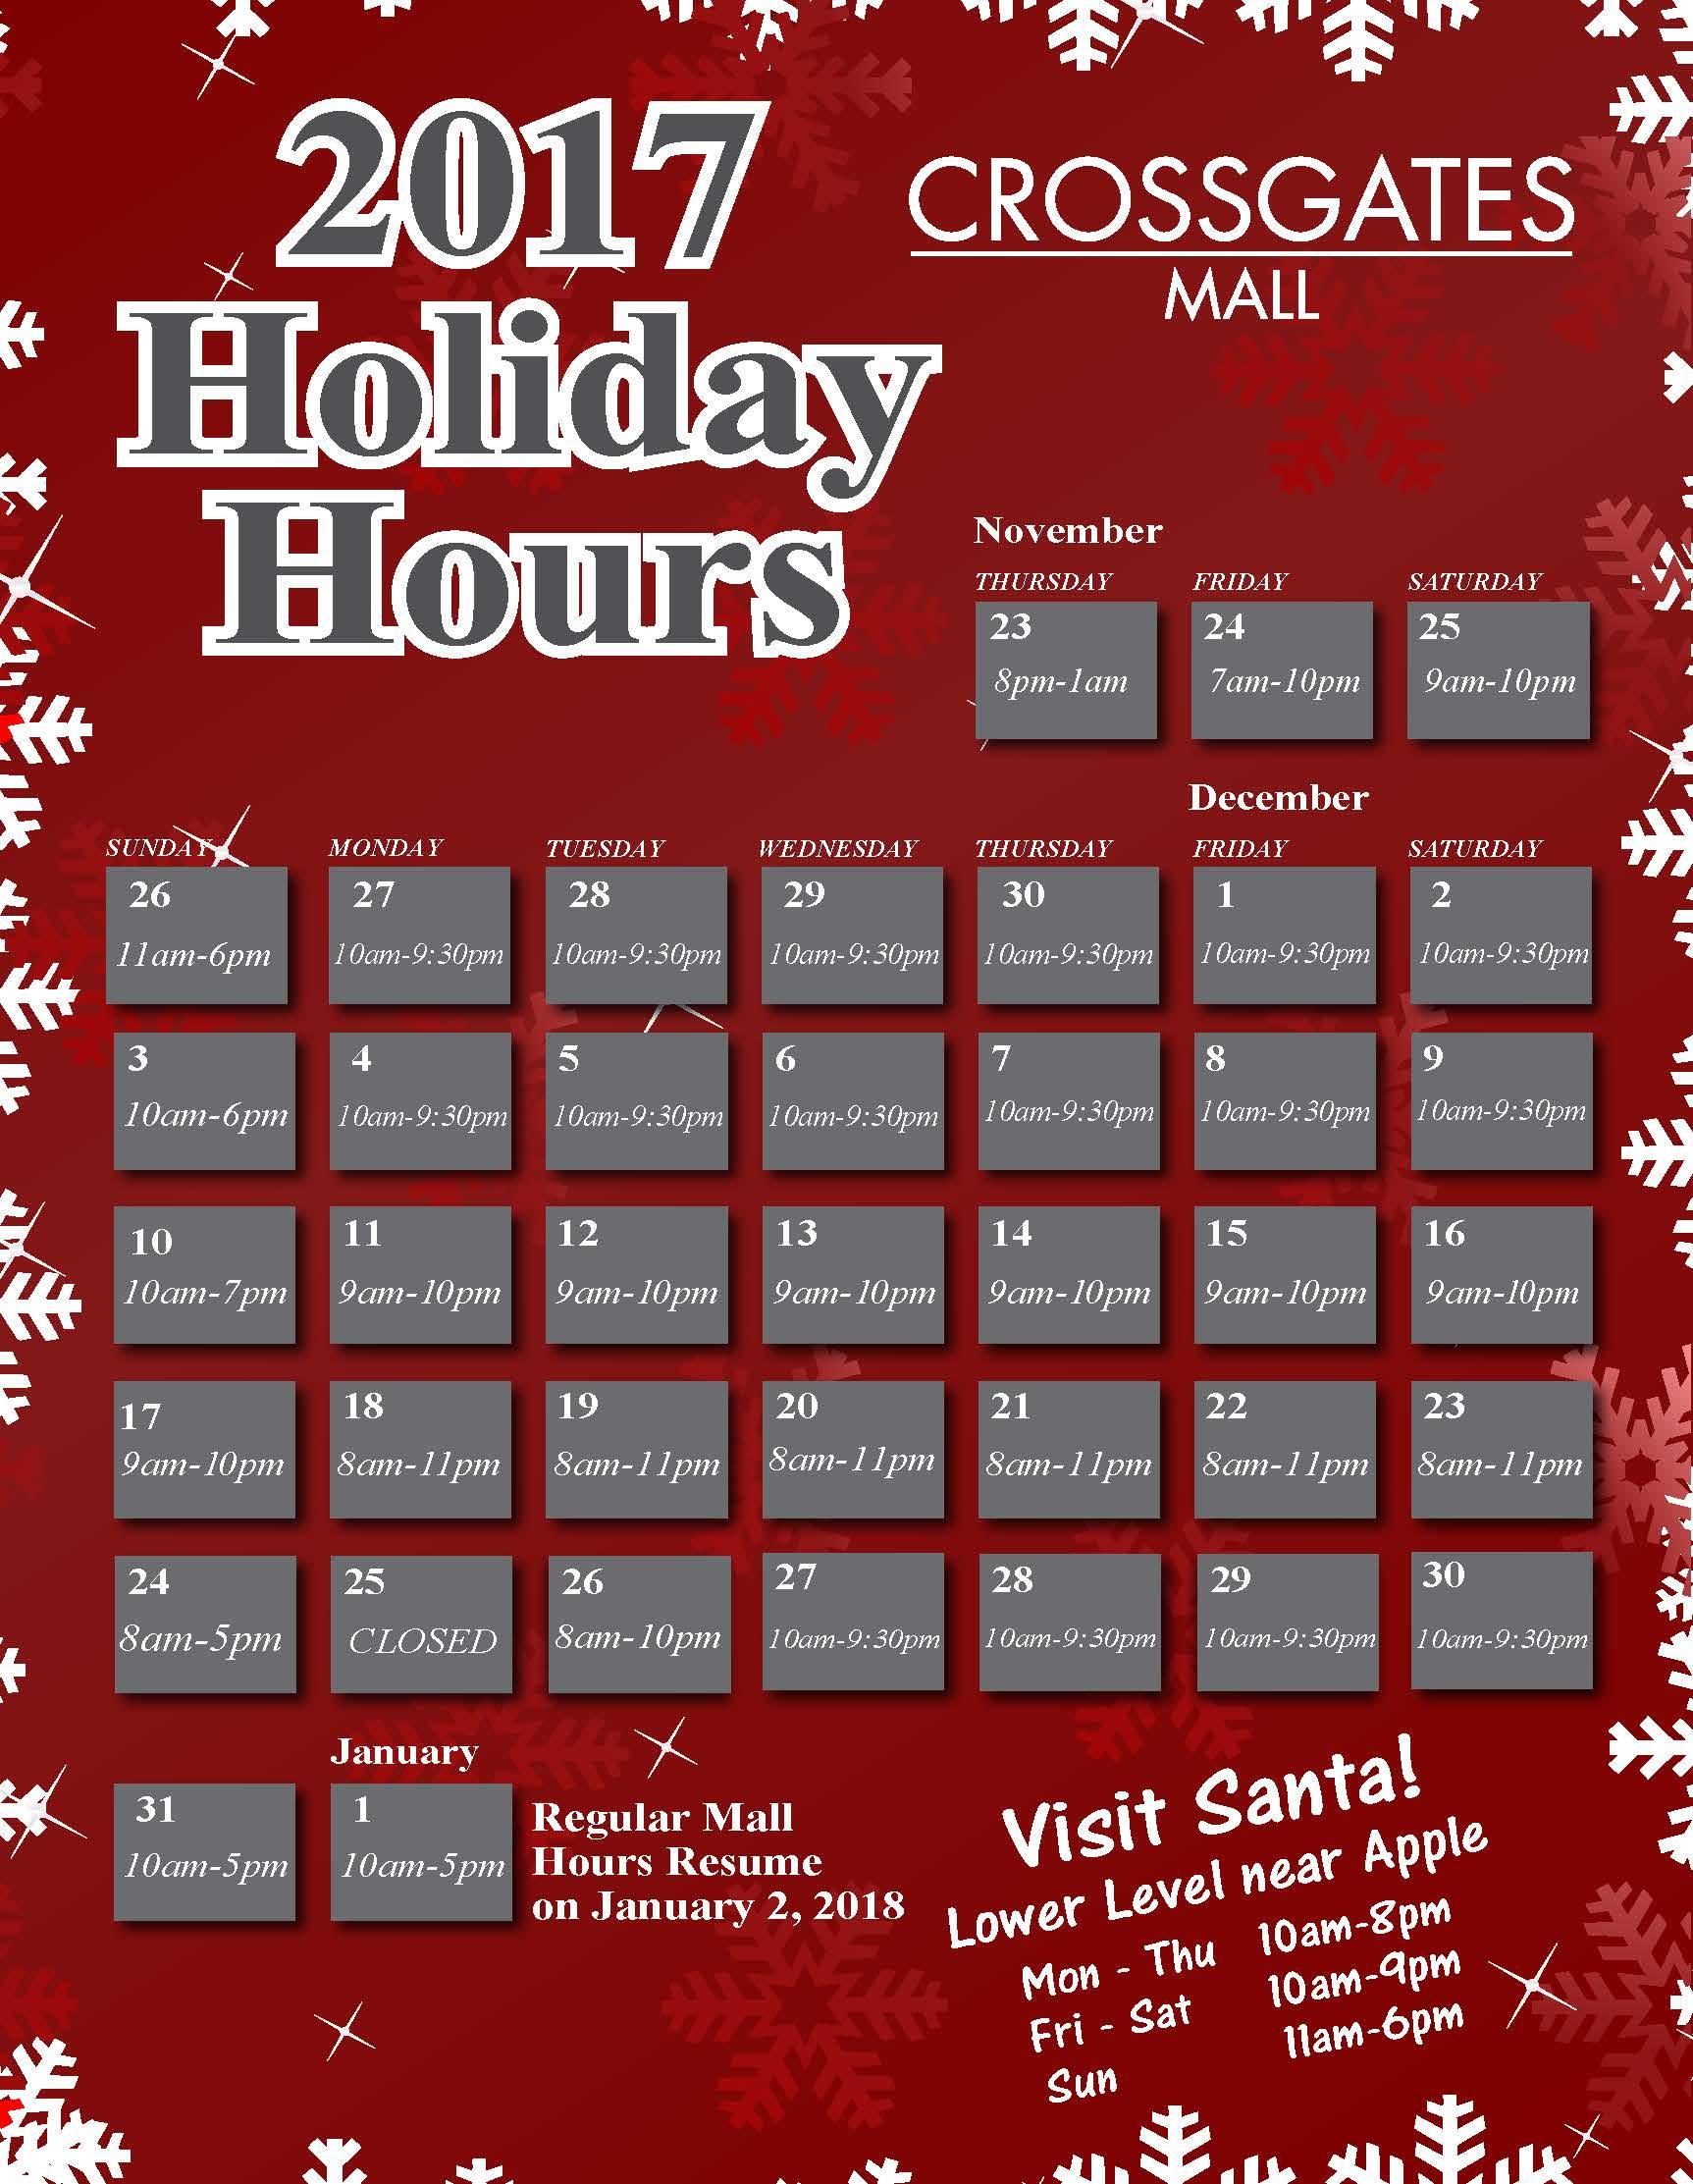 Crossgates Holiday Hours 2017_003